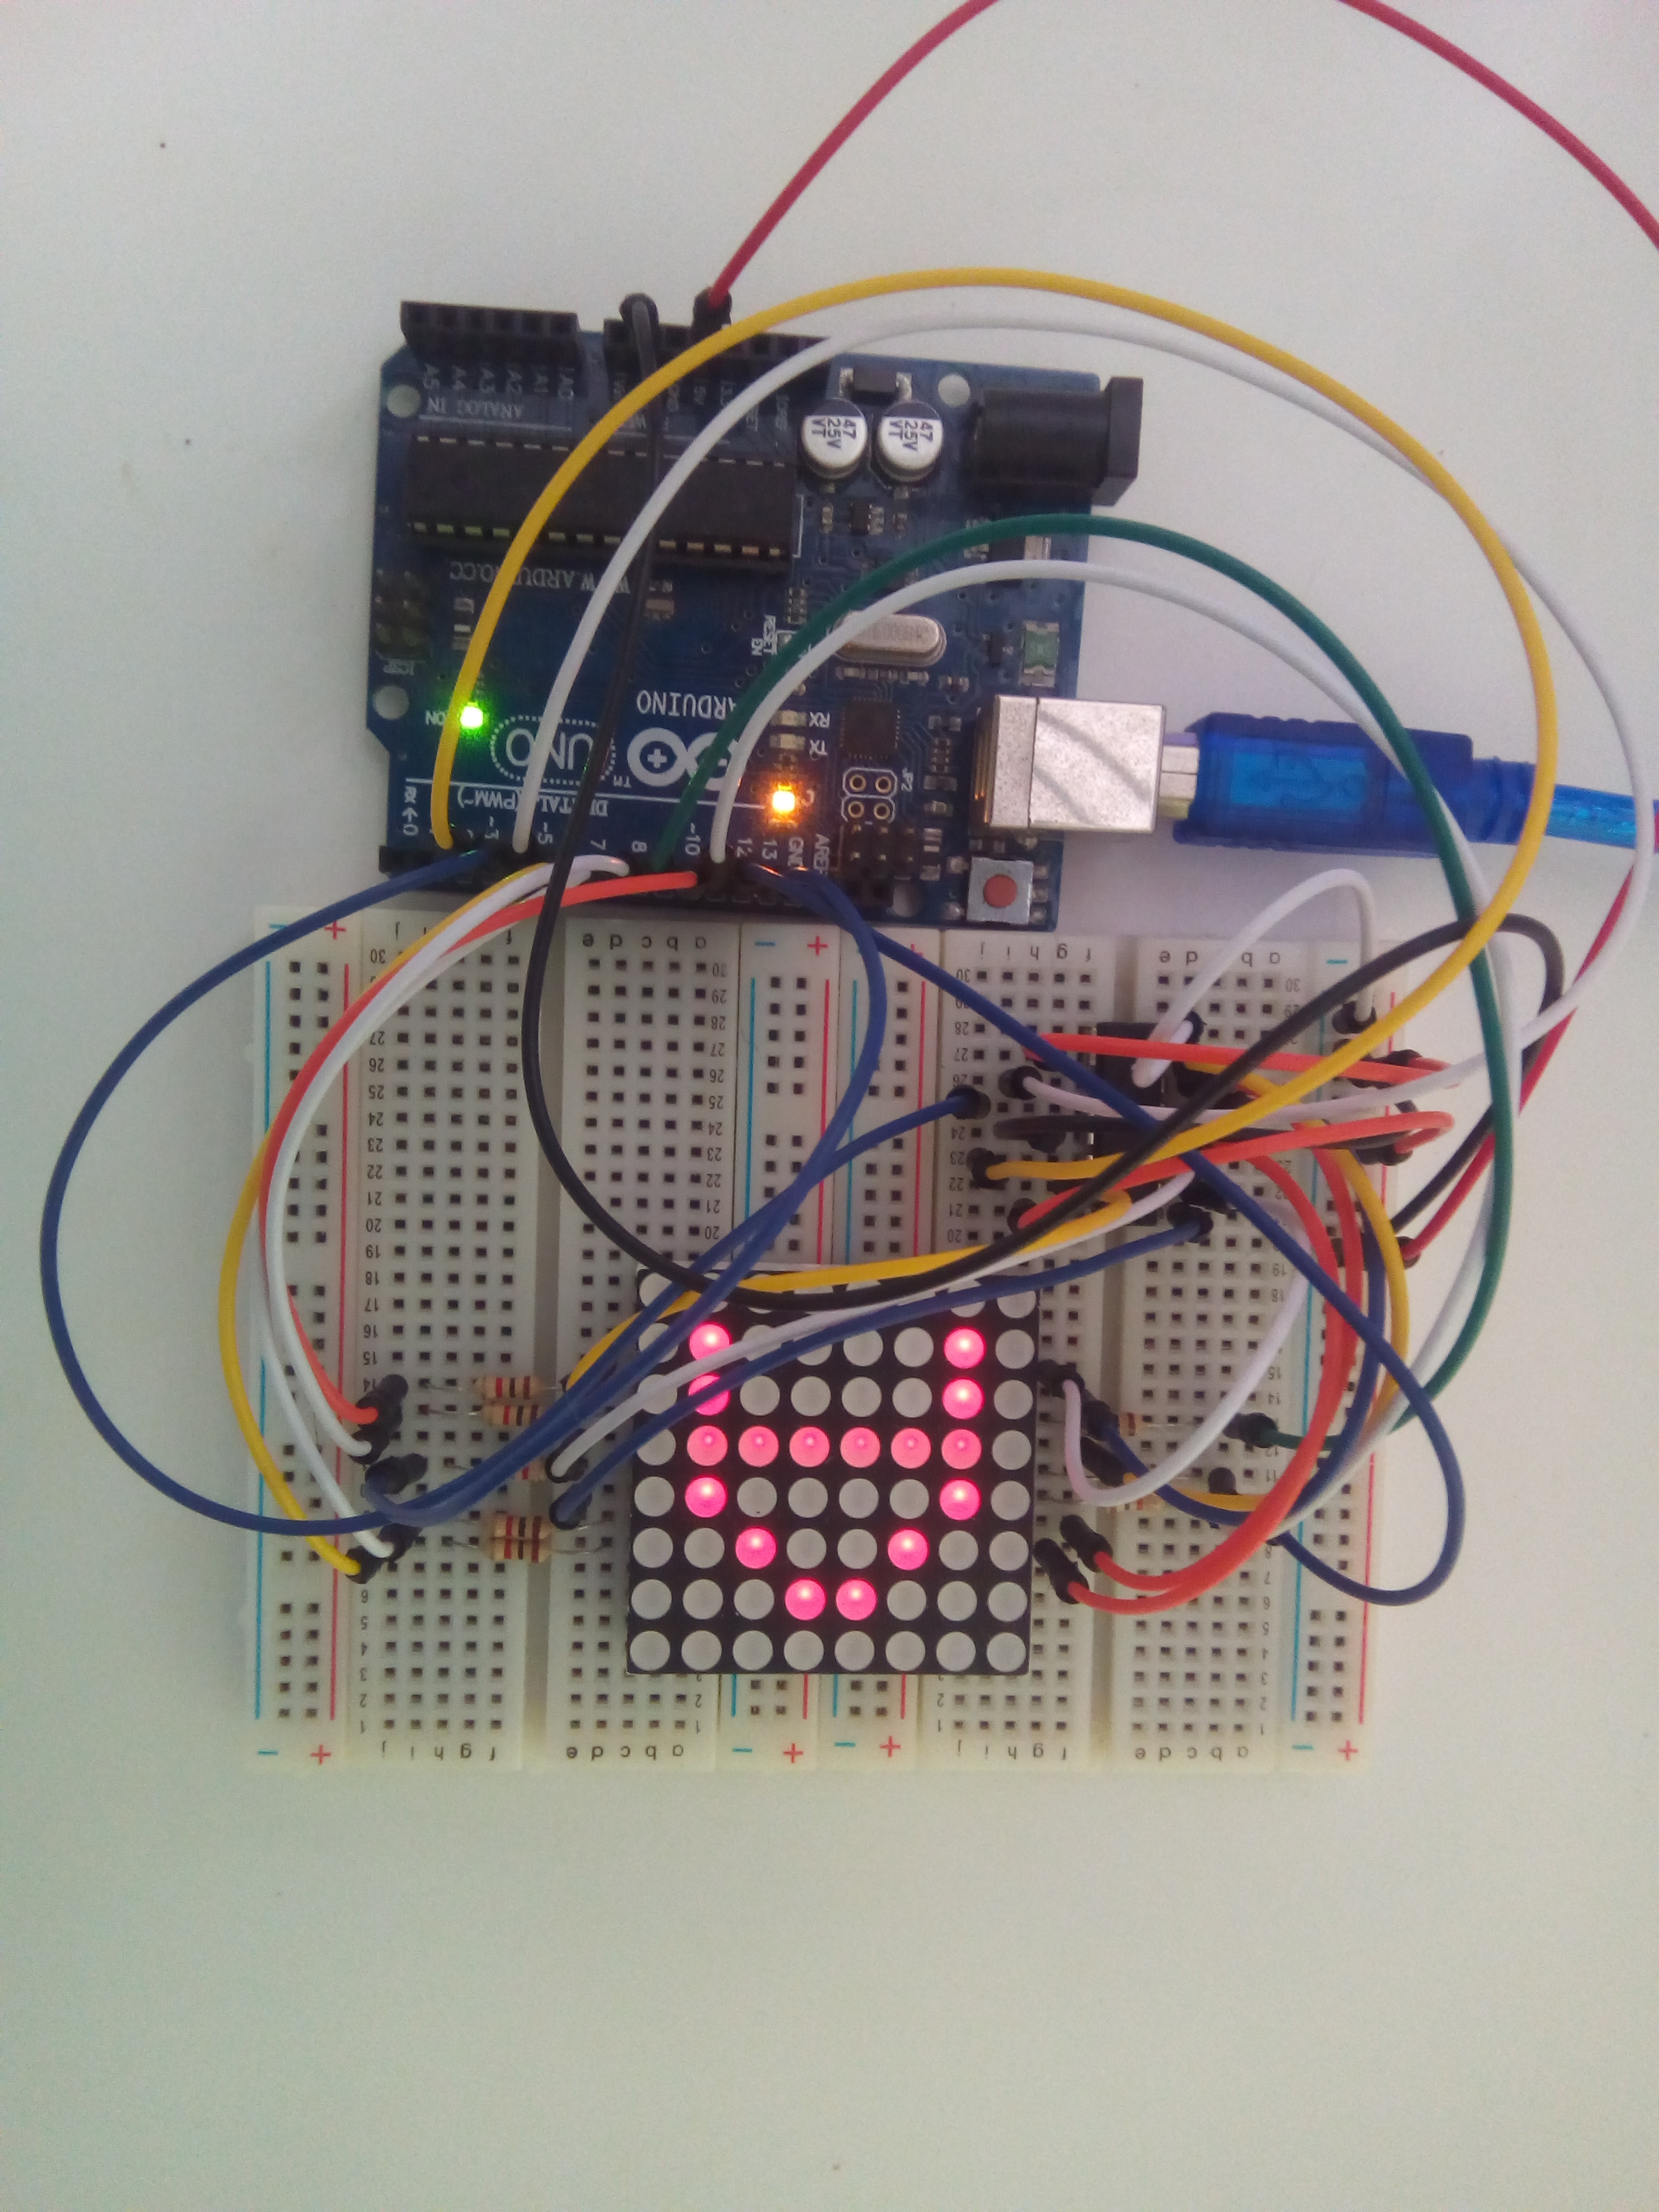 8x8 led matrix interface with arduino breadboard circuit